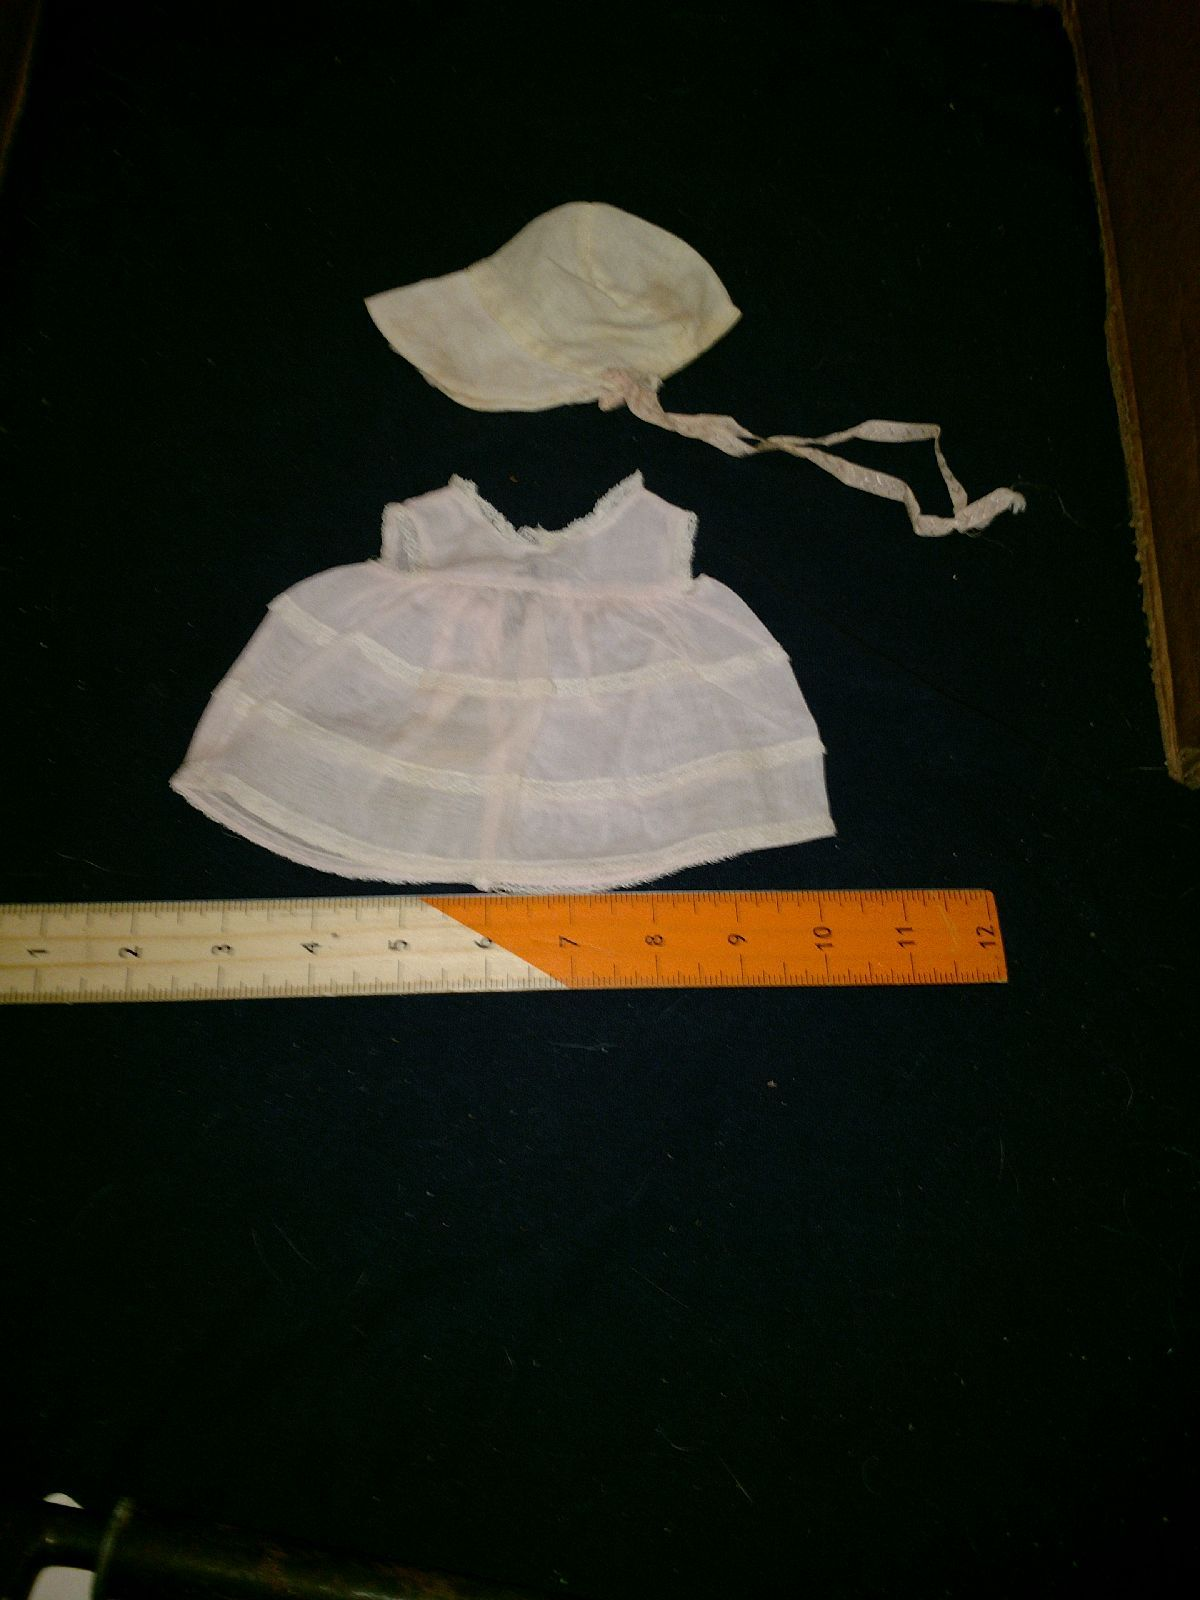 Linen baby doll dress sleeveless pale pink dress white bonnet Linen baby doll dress sleeveless pale pink dress white bonnet. Perfect shape   https://nemb.ly/p/SJU=3hh2e Happily published via Nembol